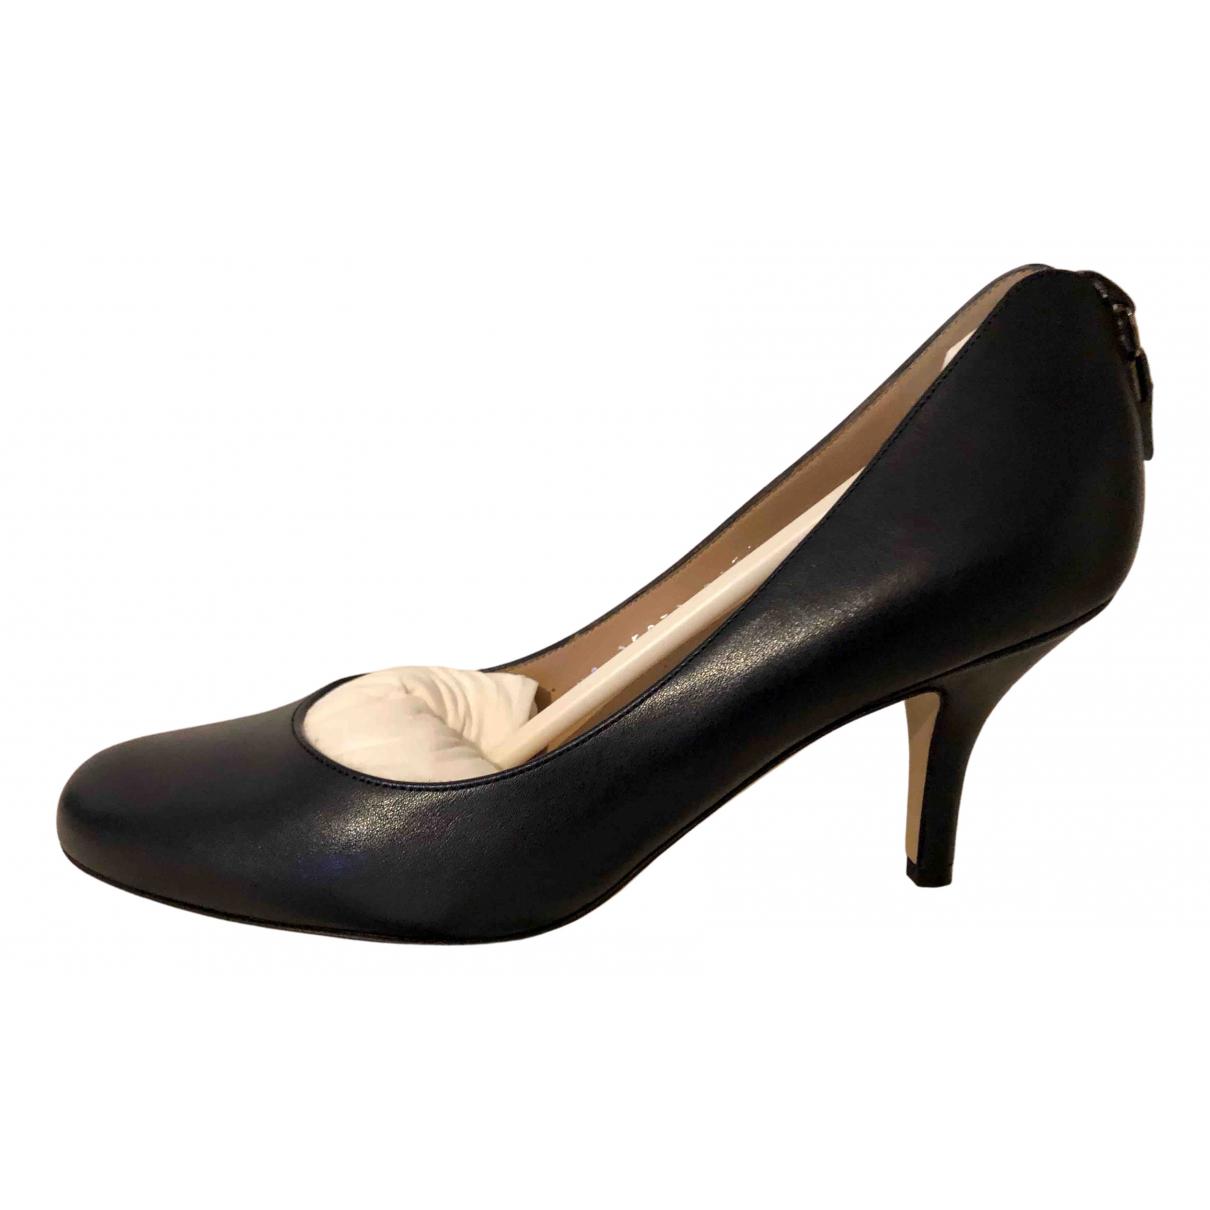 Salvatore Ferragamo N Navy Leather Heels for Women 36 EU